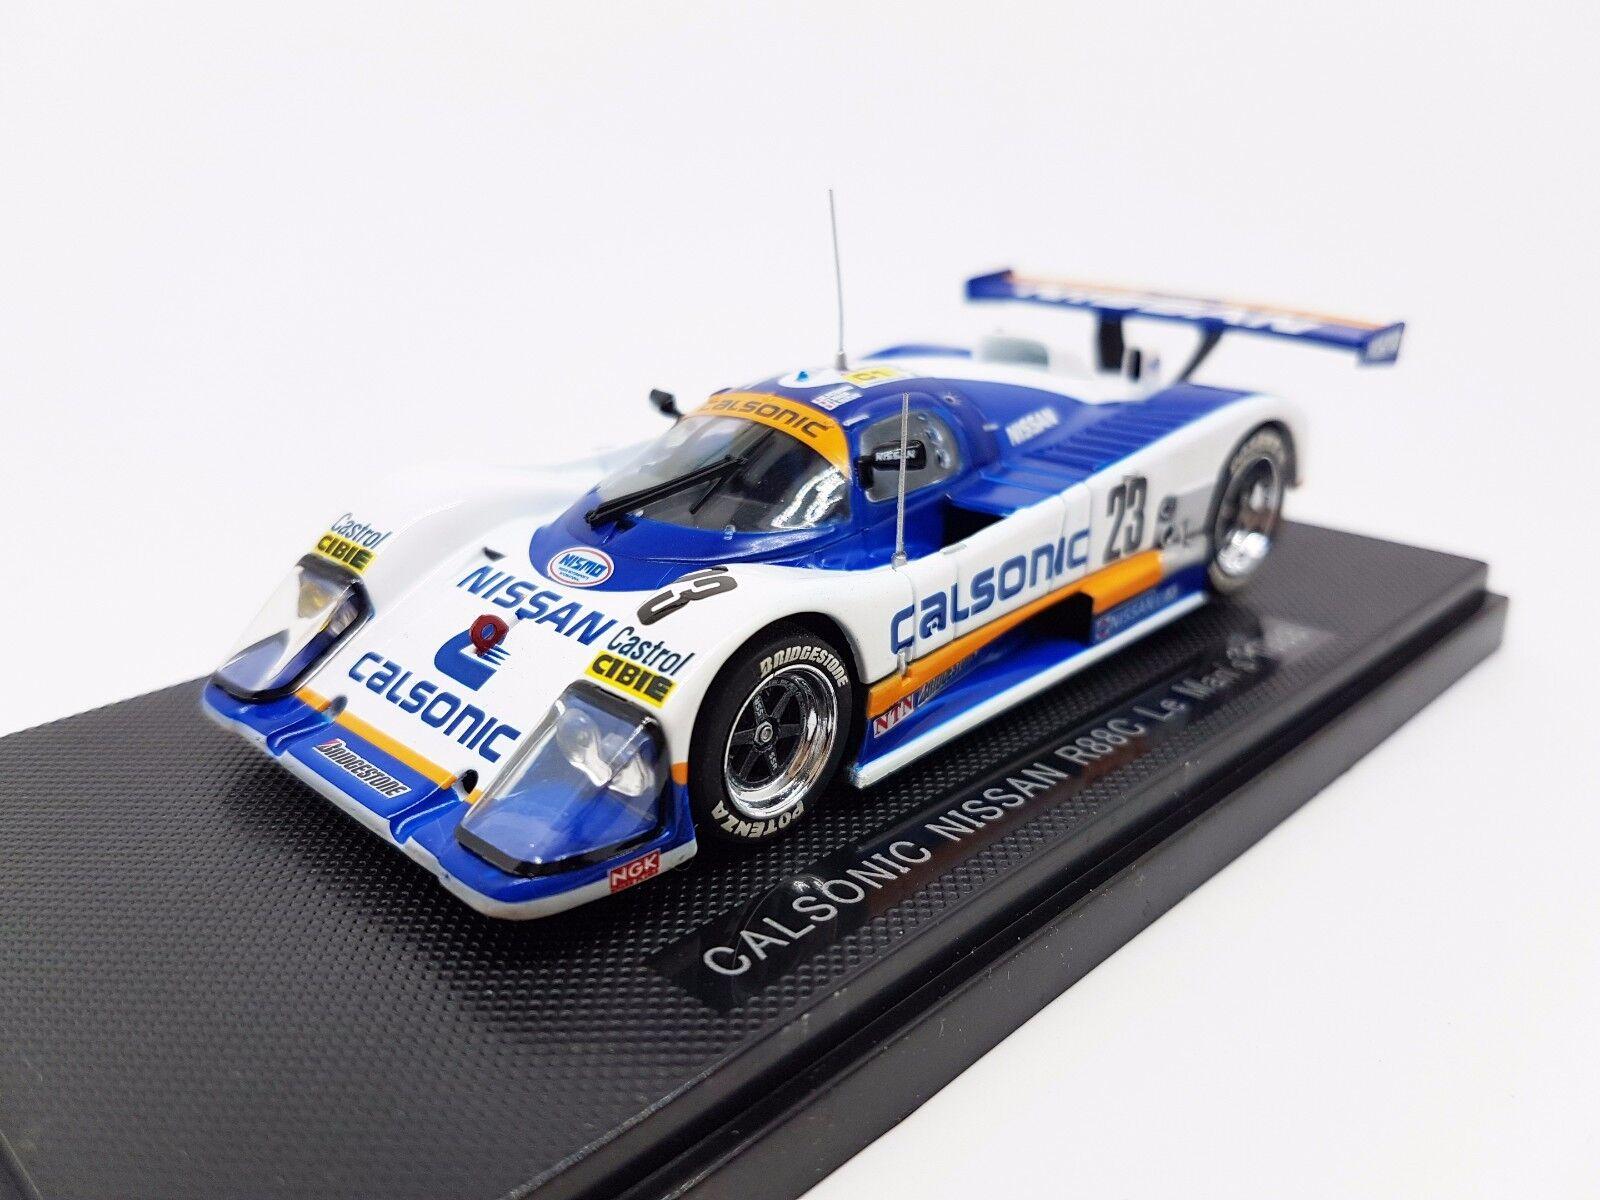 Rare 1 43 Ebbro Calsonic Nissan R88C Le Mans 1988 White bluee 680